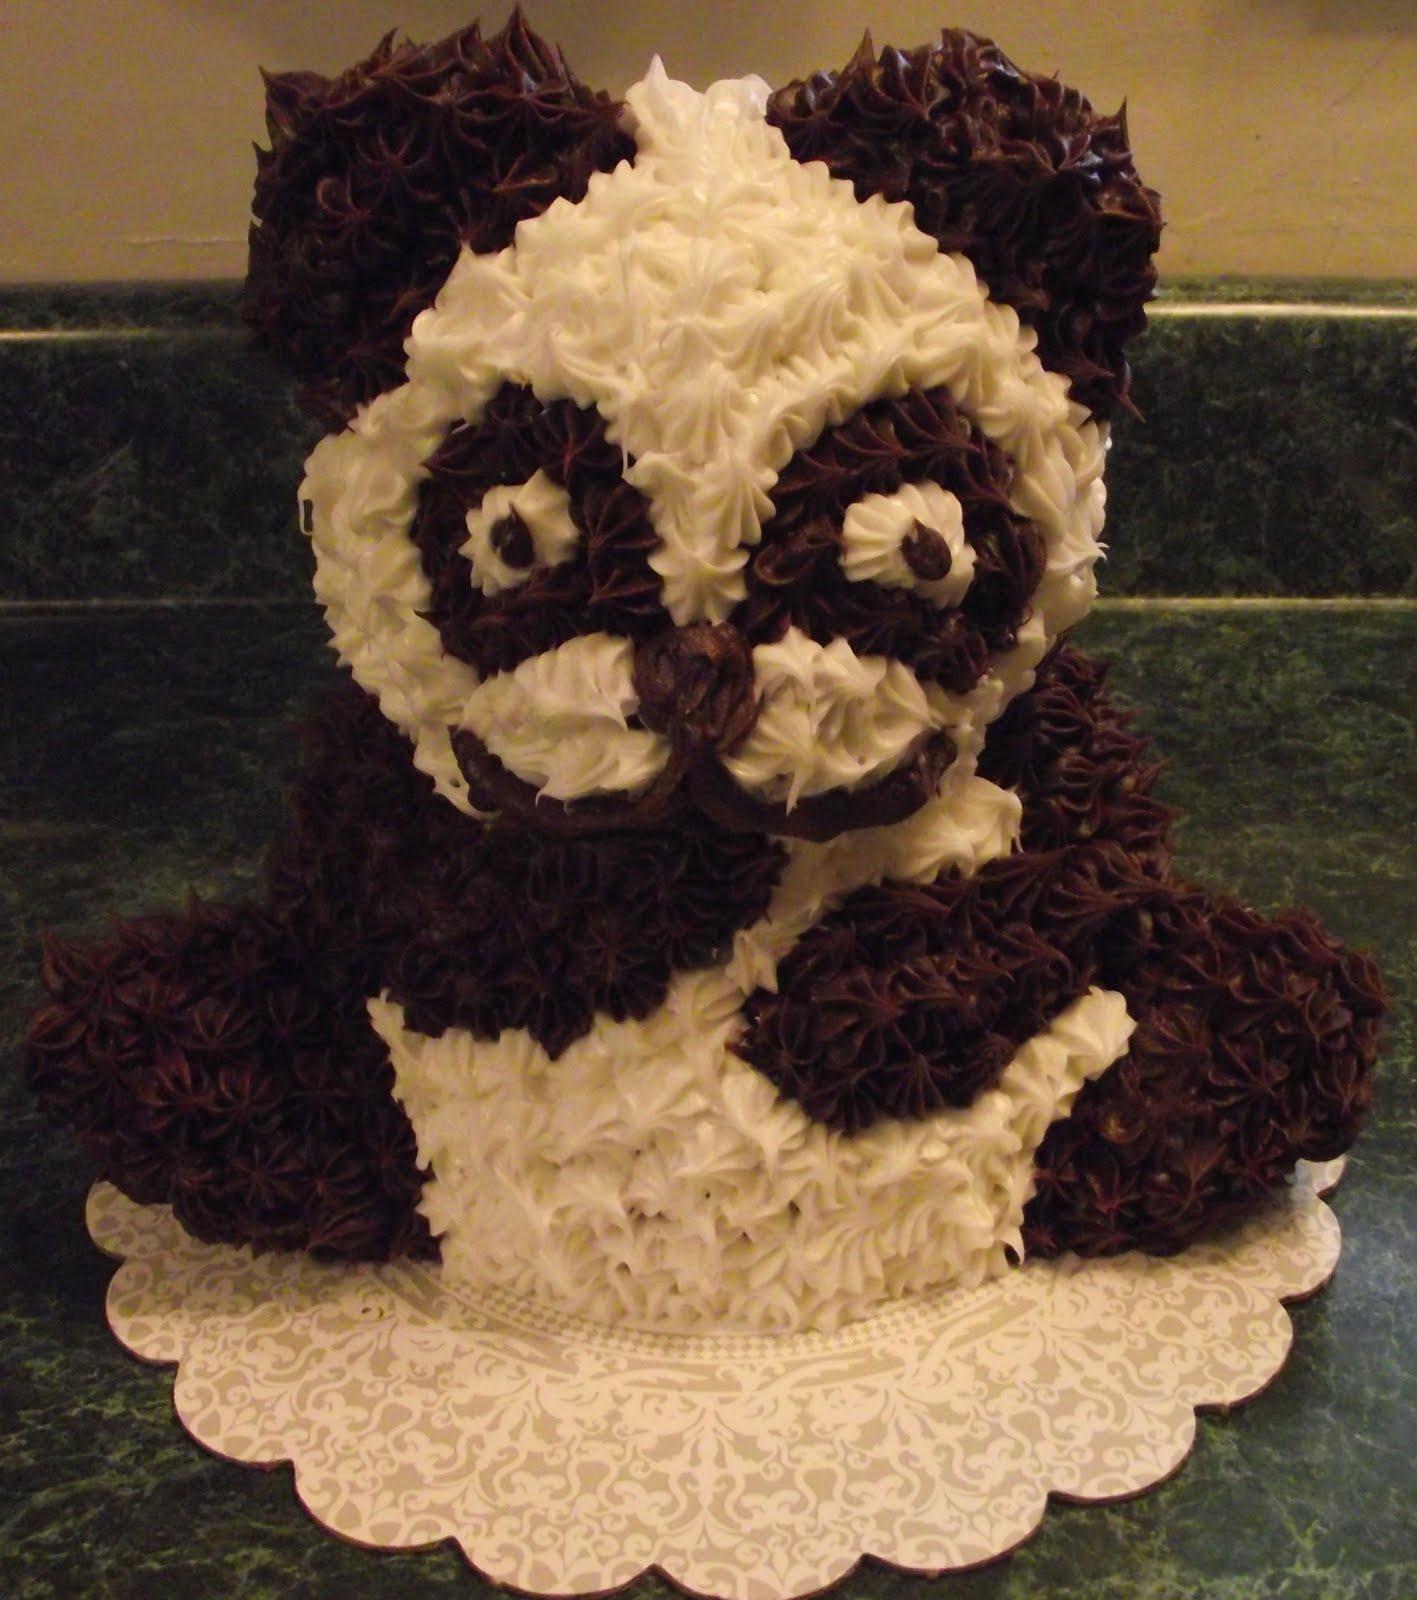 Pin panda bear face template picture cake on pinterest for Panda bear cake template